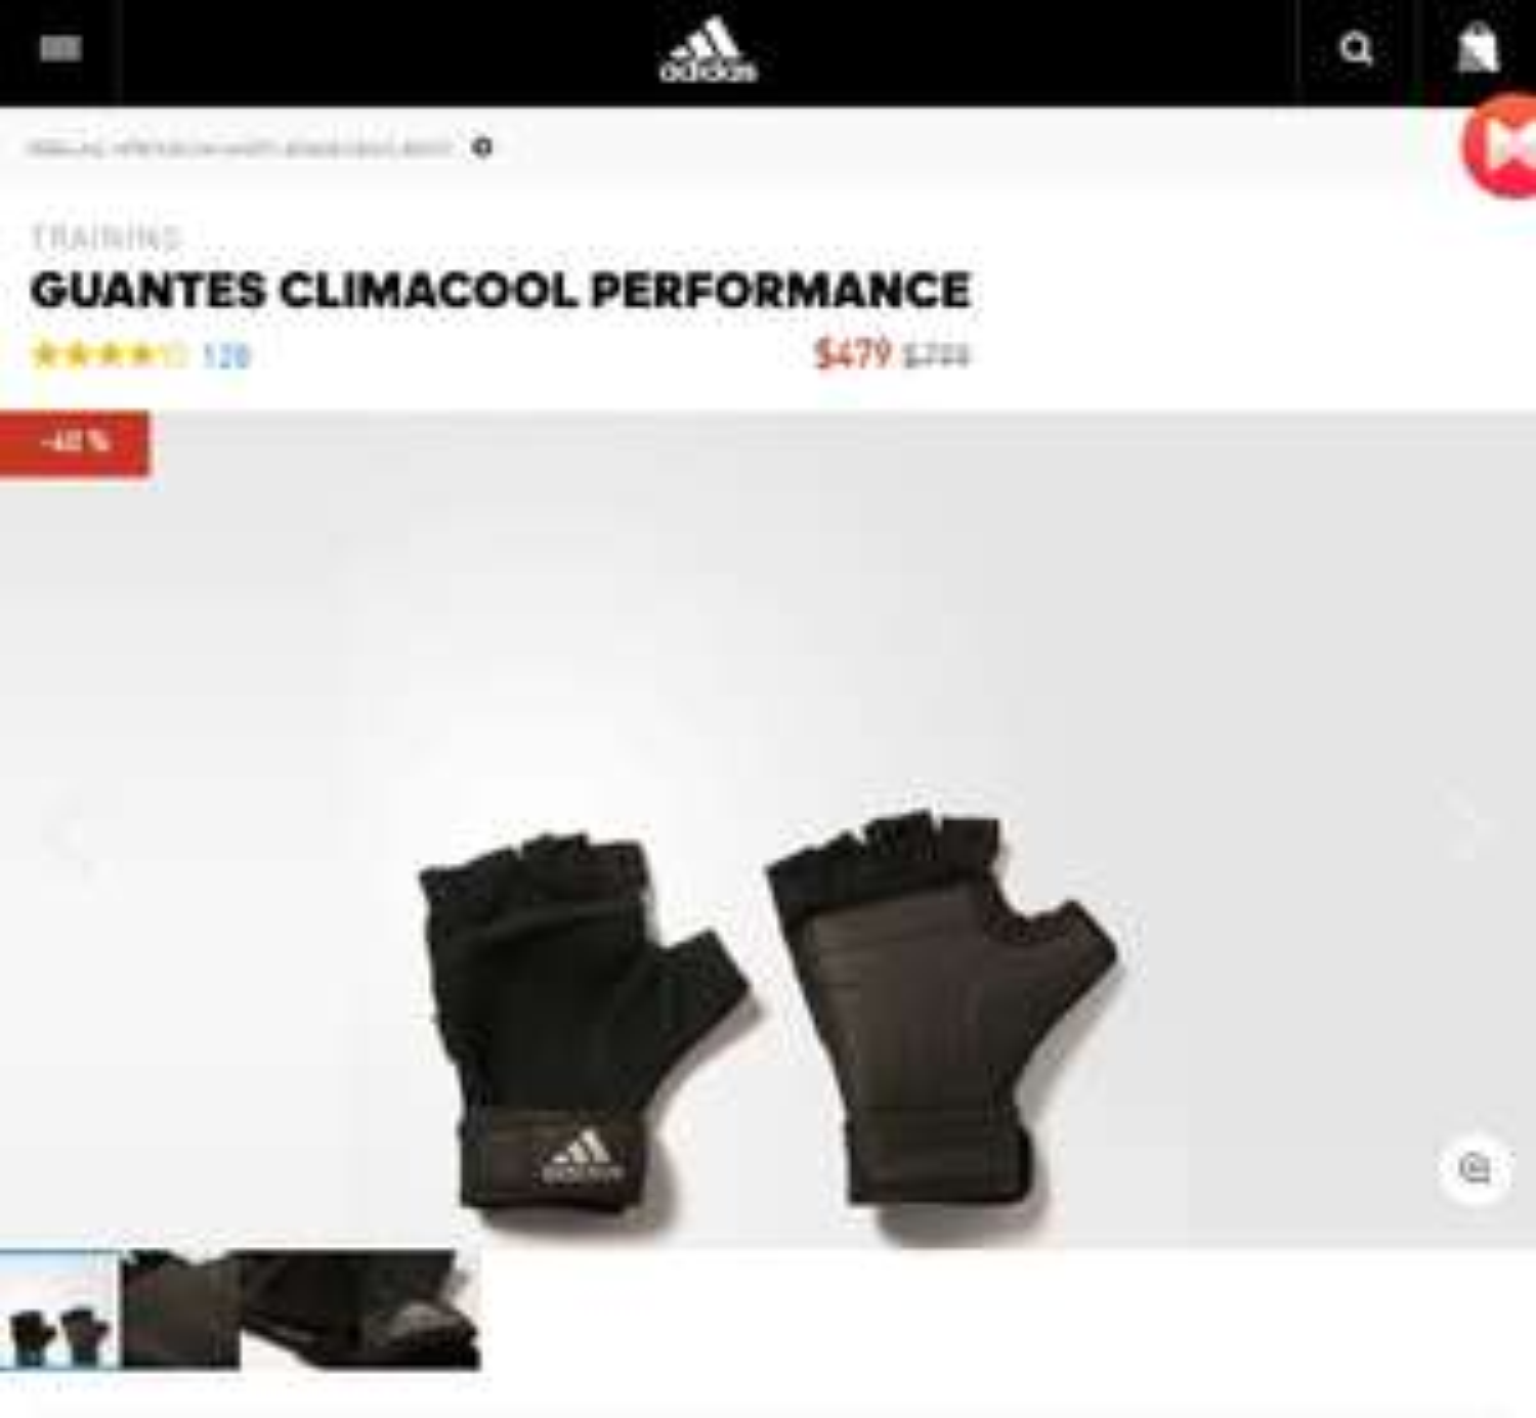 Adidas: Guantes Gym Climacool